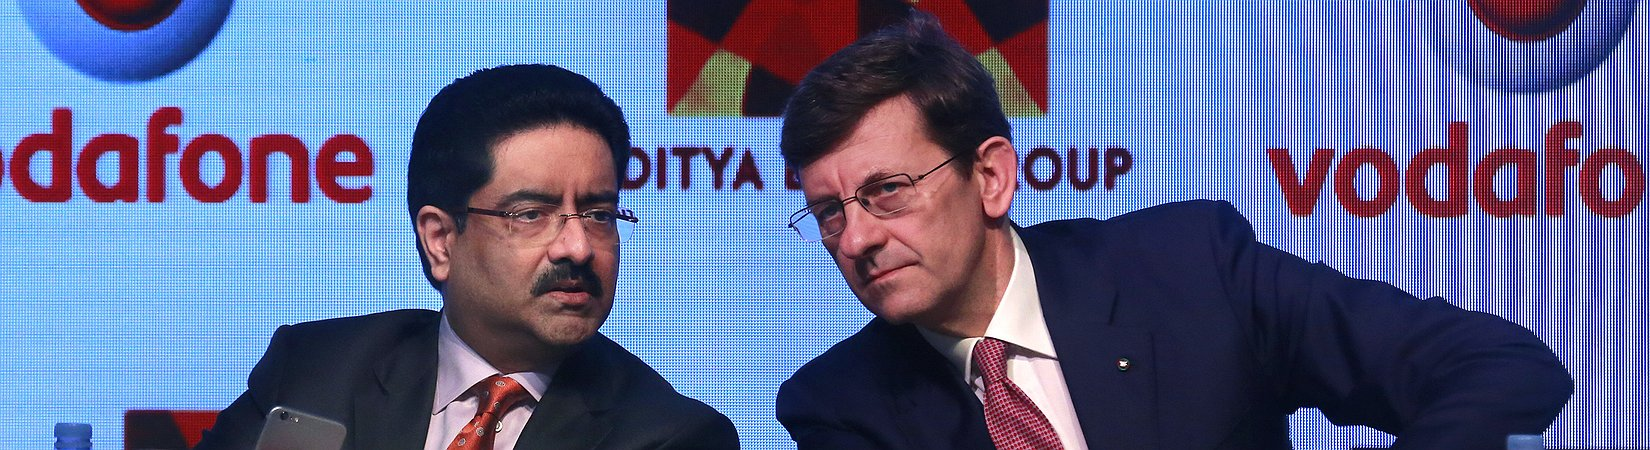 Vodafone, Idea merge to create India's largest telco